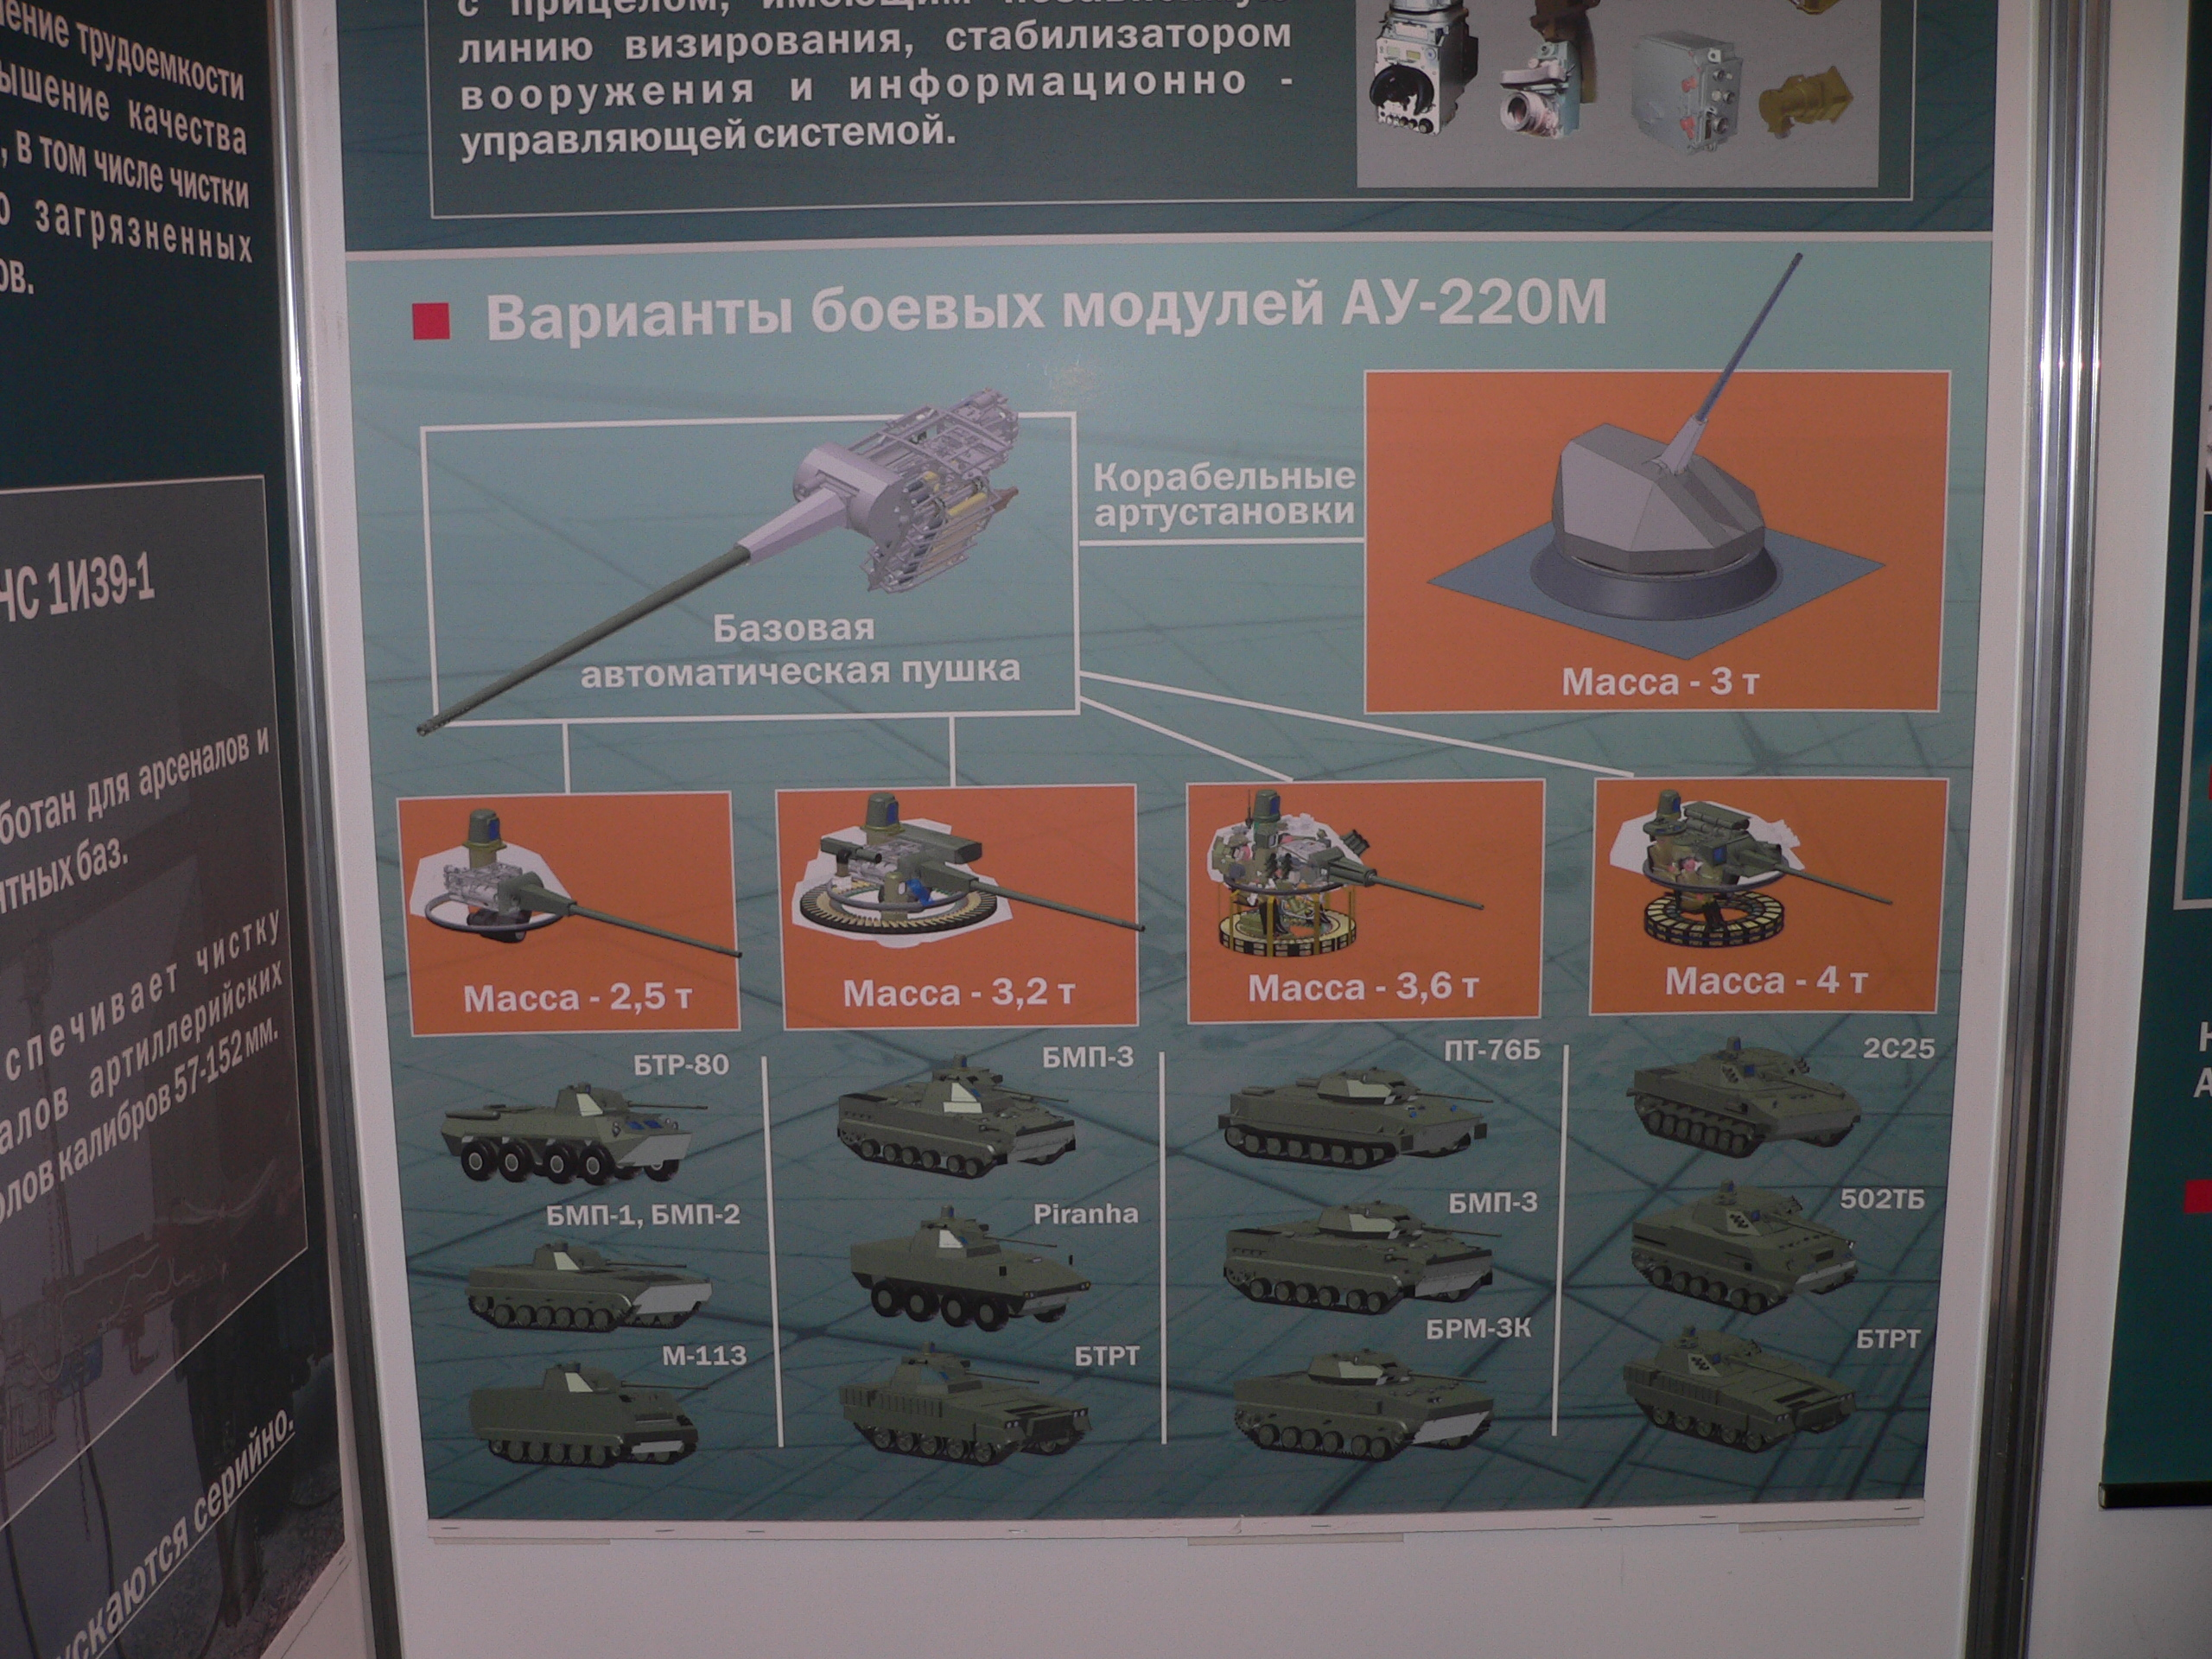 Russia Arms Expo 2013 0e47Y